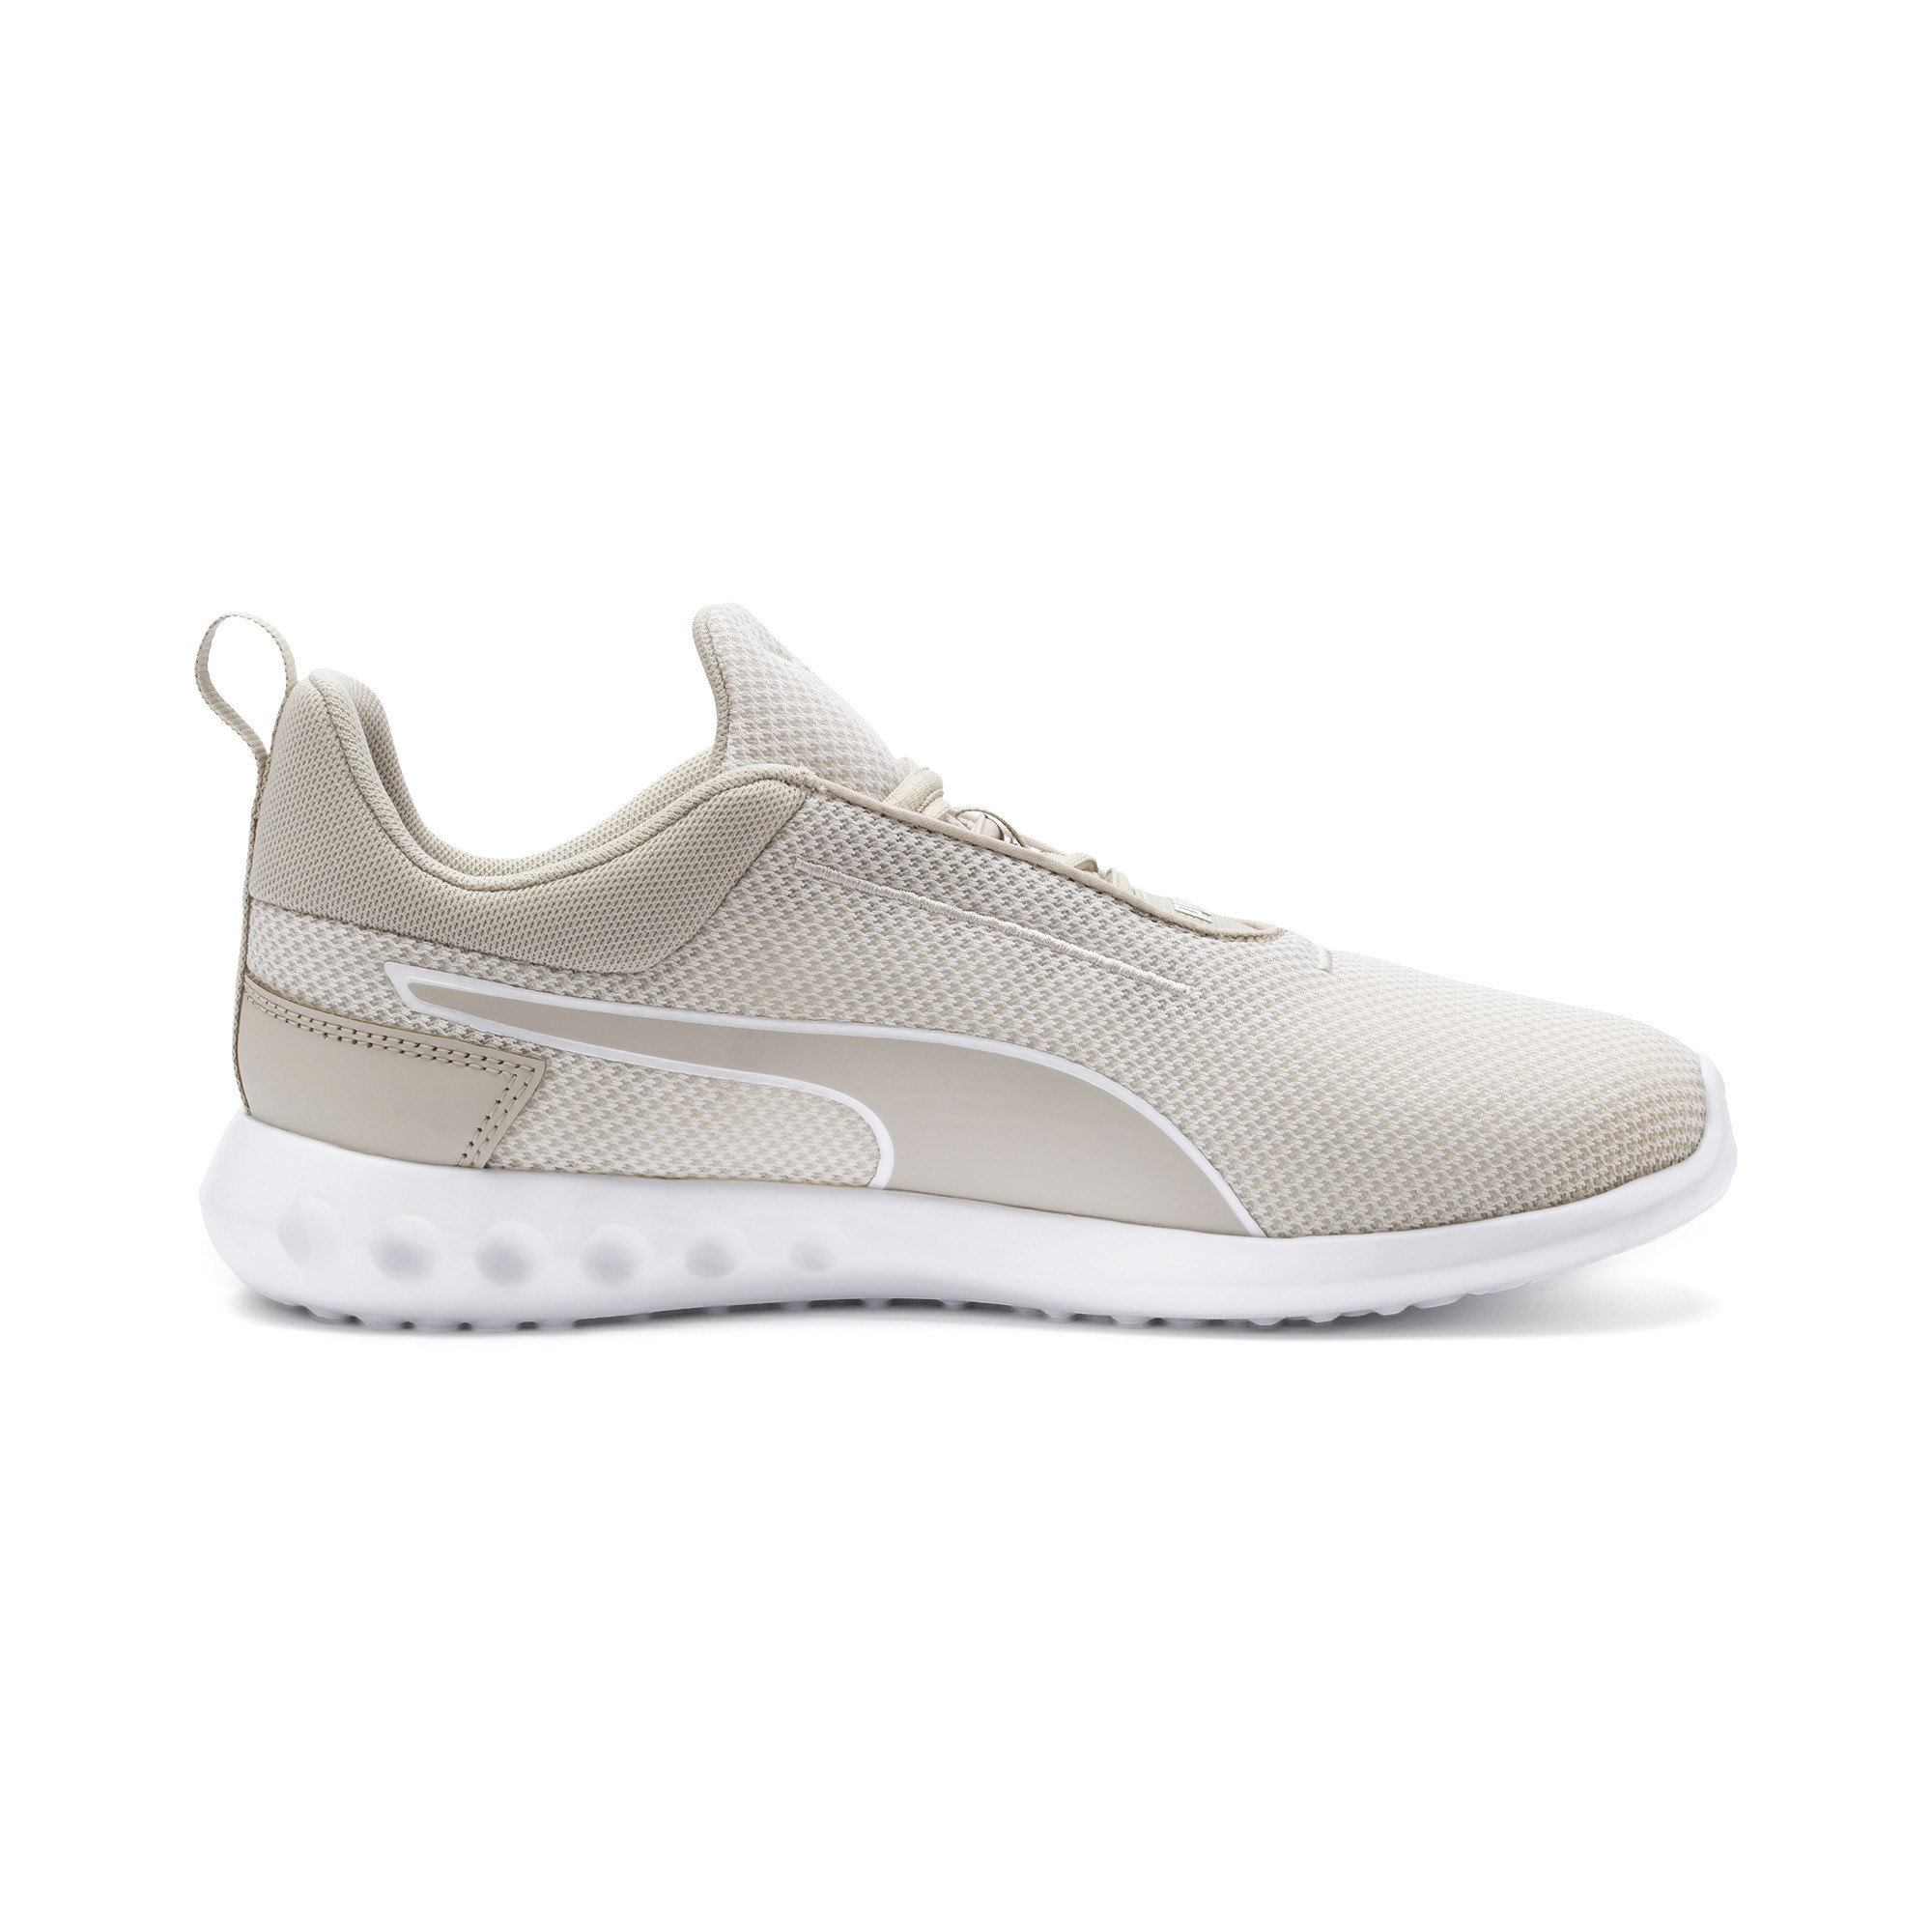 PUMA-Carson-2-Concave-Women-s-Training-Shoes-Women-Shoe-Running thumbnail 6